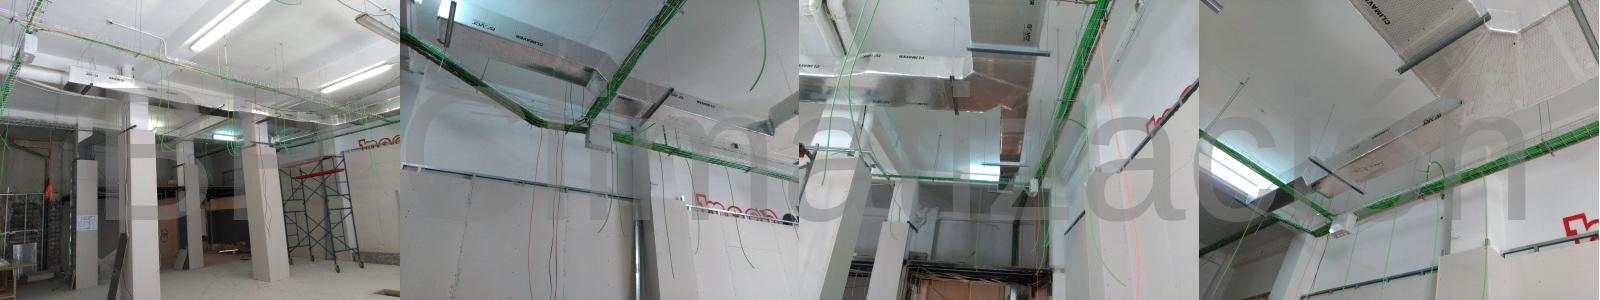 BP Climatización 976902922 Preinstalación de aire acondicionado en local parafarmacia